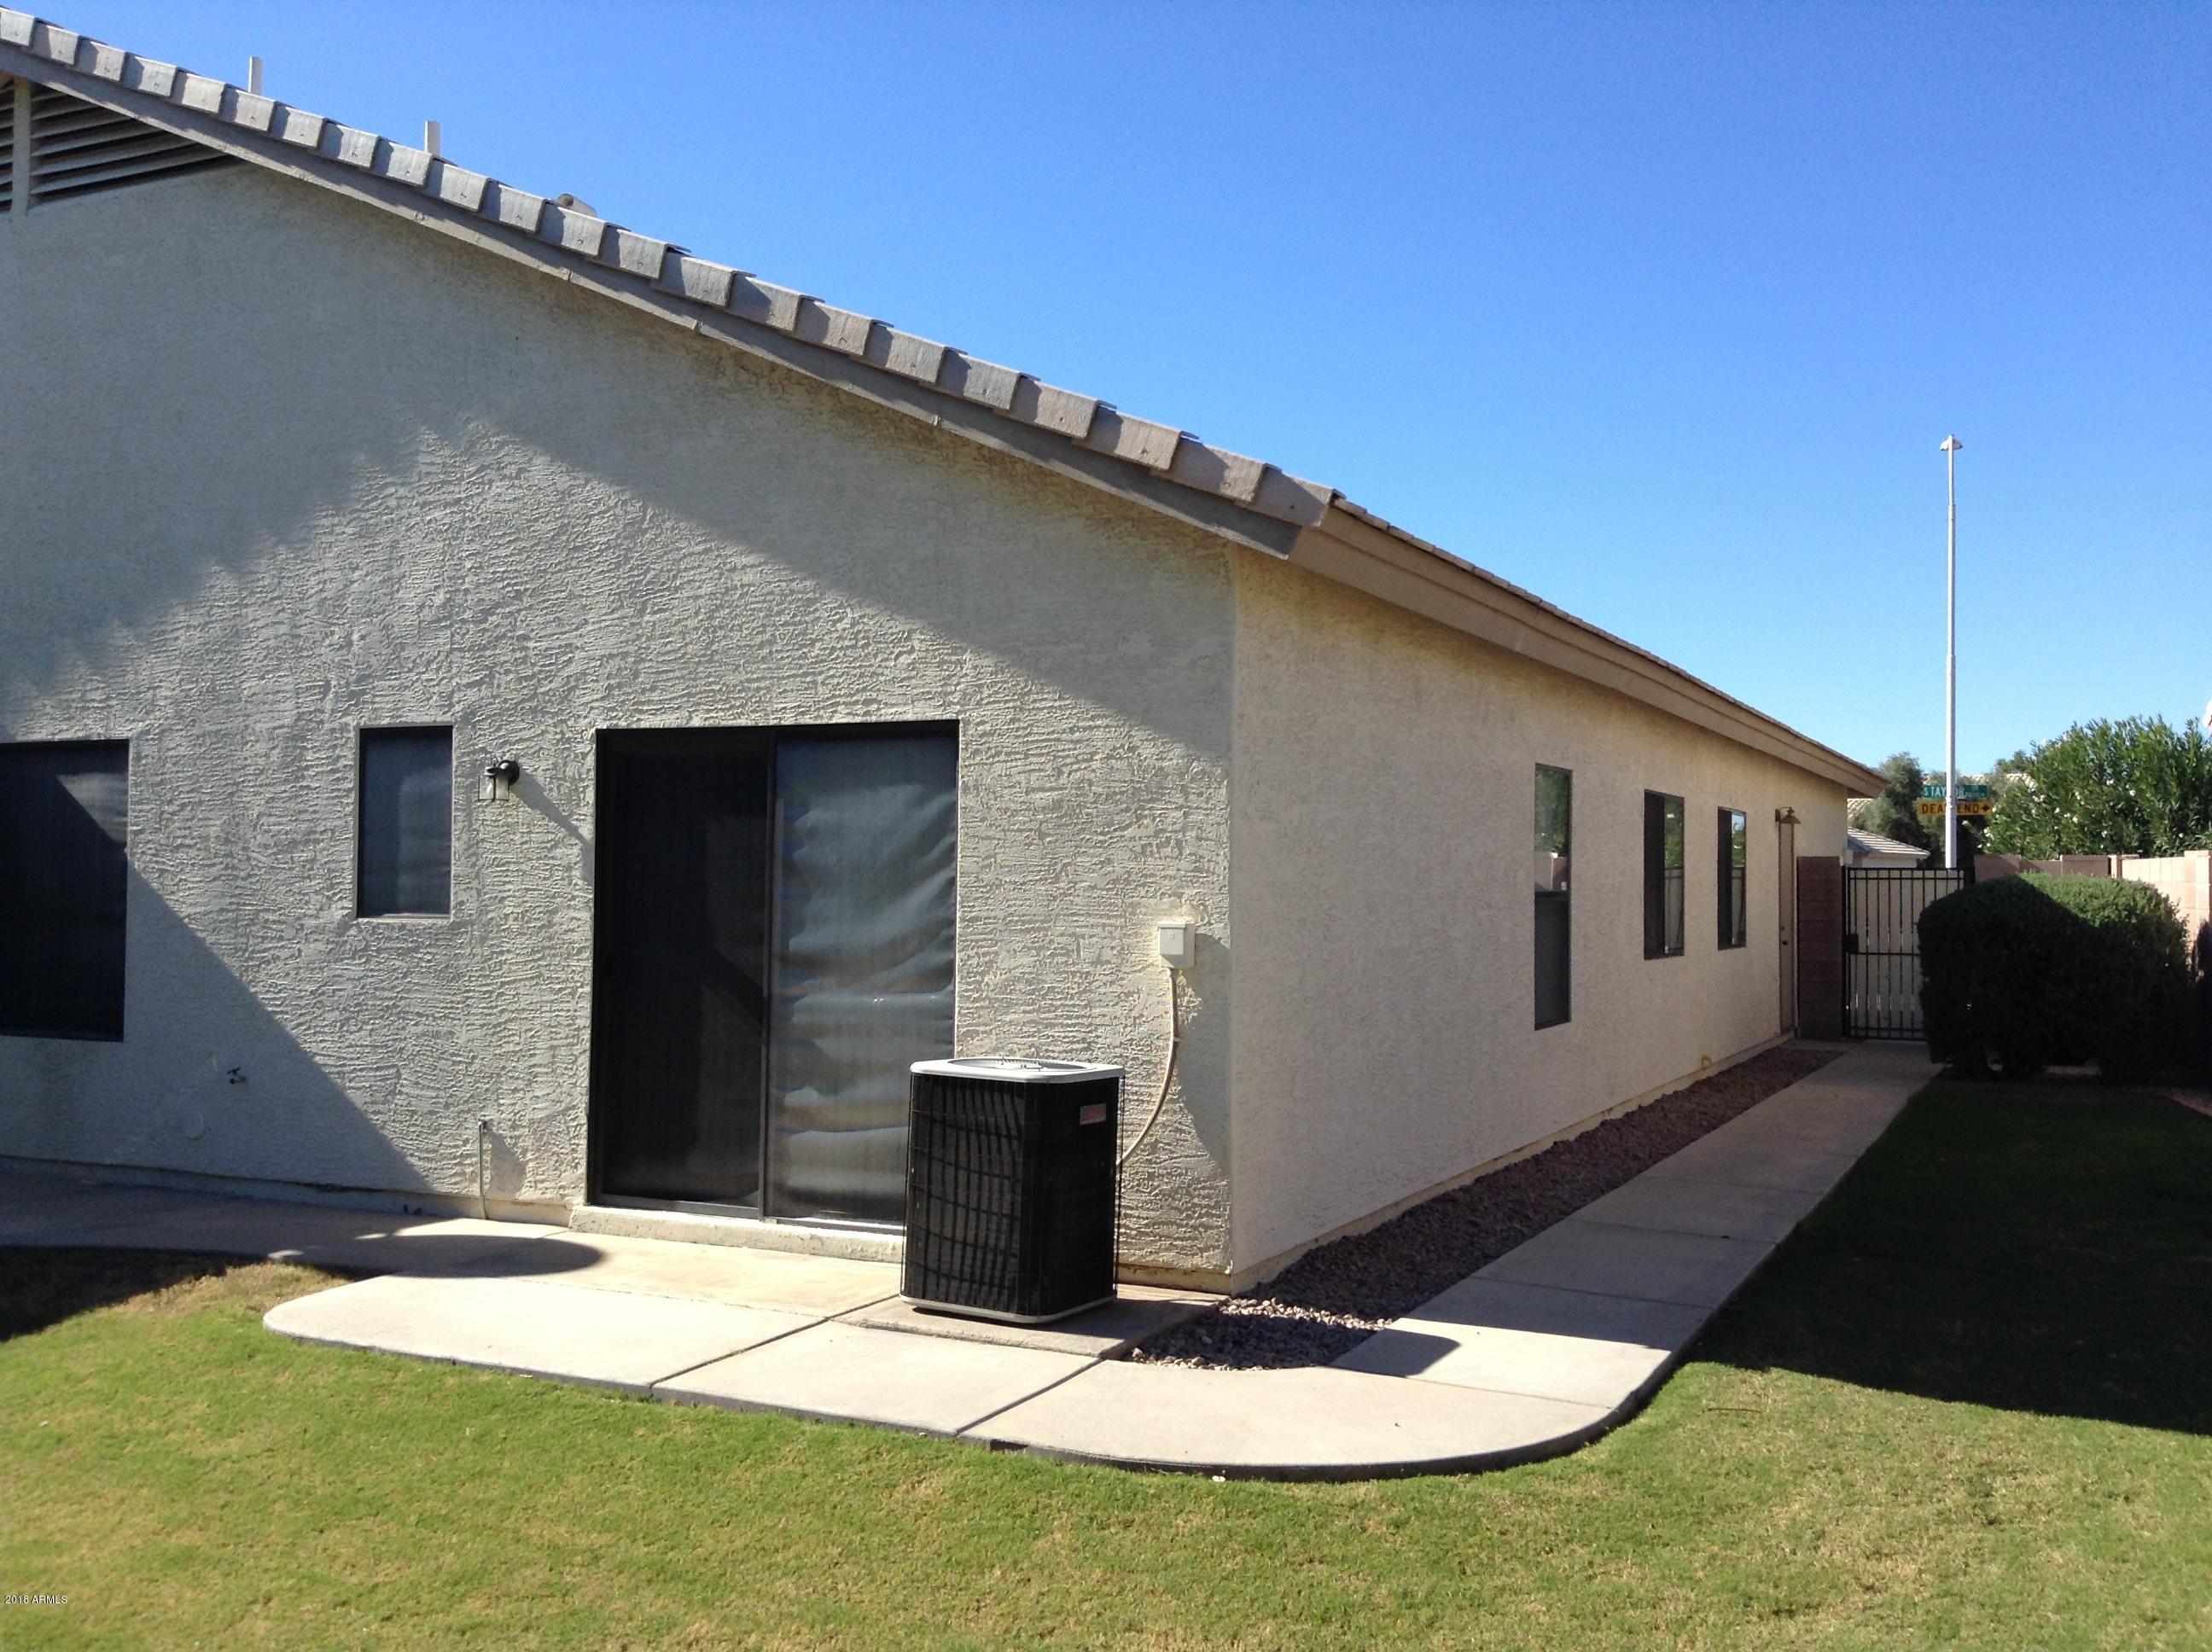 MLS 5853667 7099 S TAYLOR Drive, Tempe, AZ 85283 Tempe AZ Oasis At Anozira